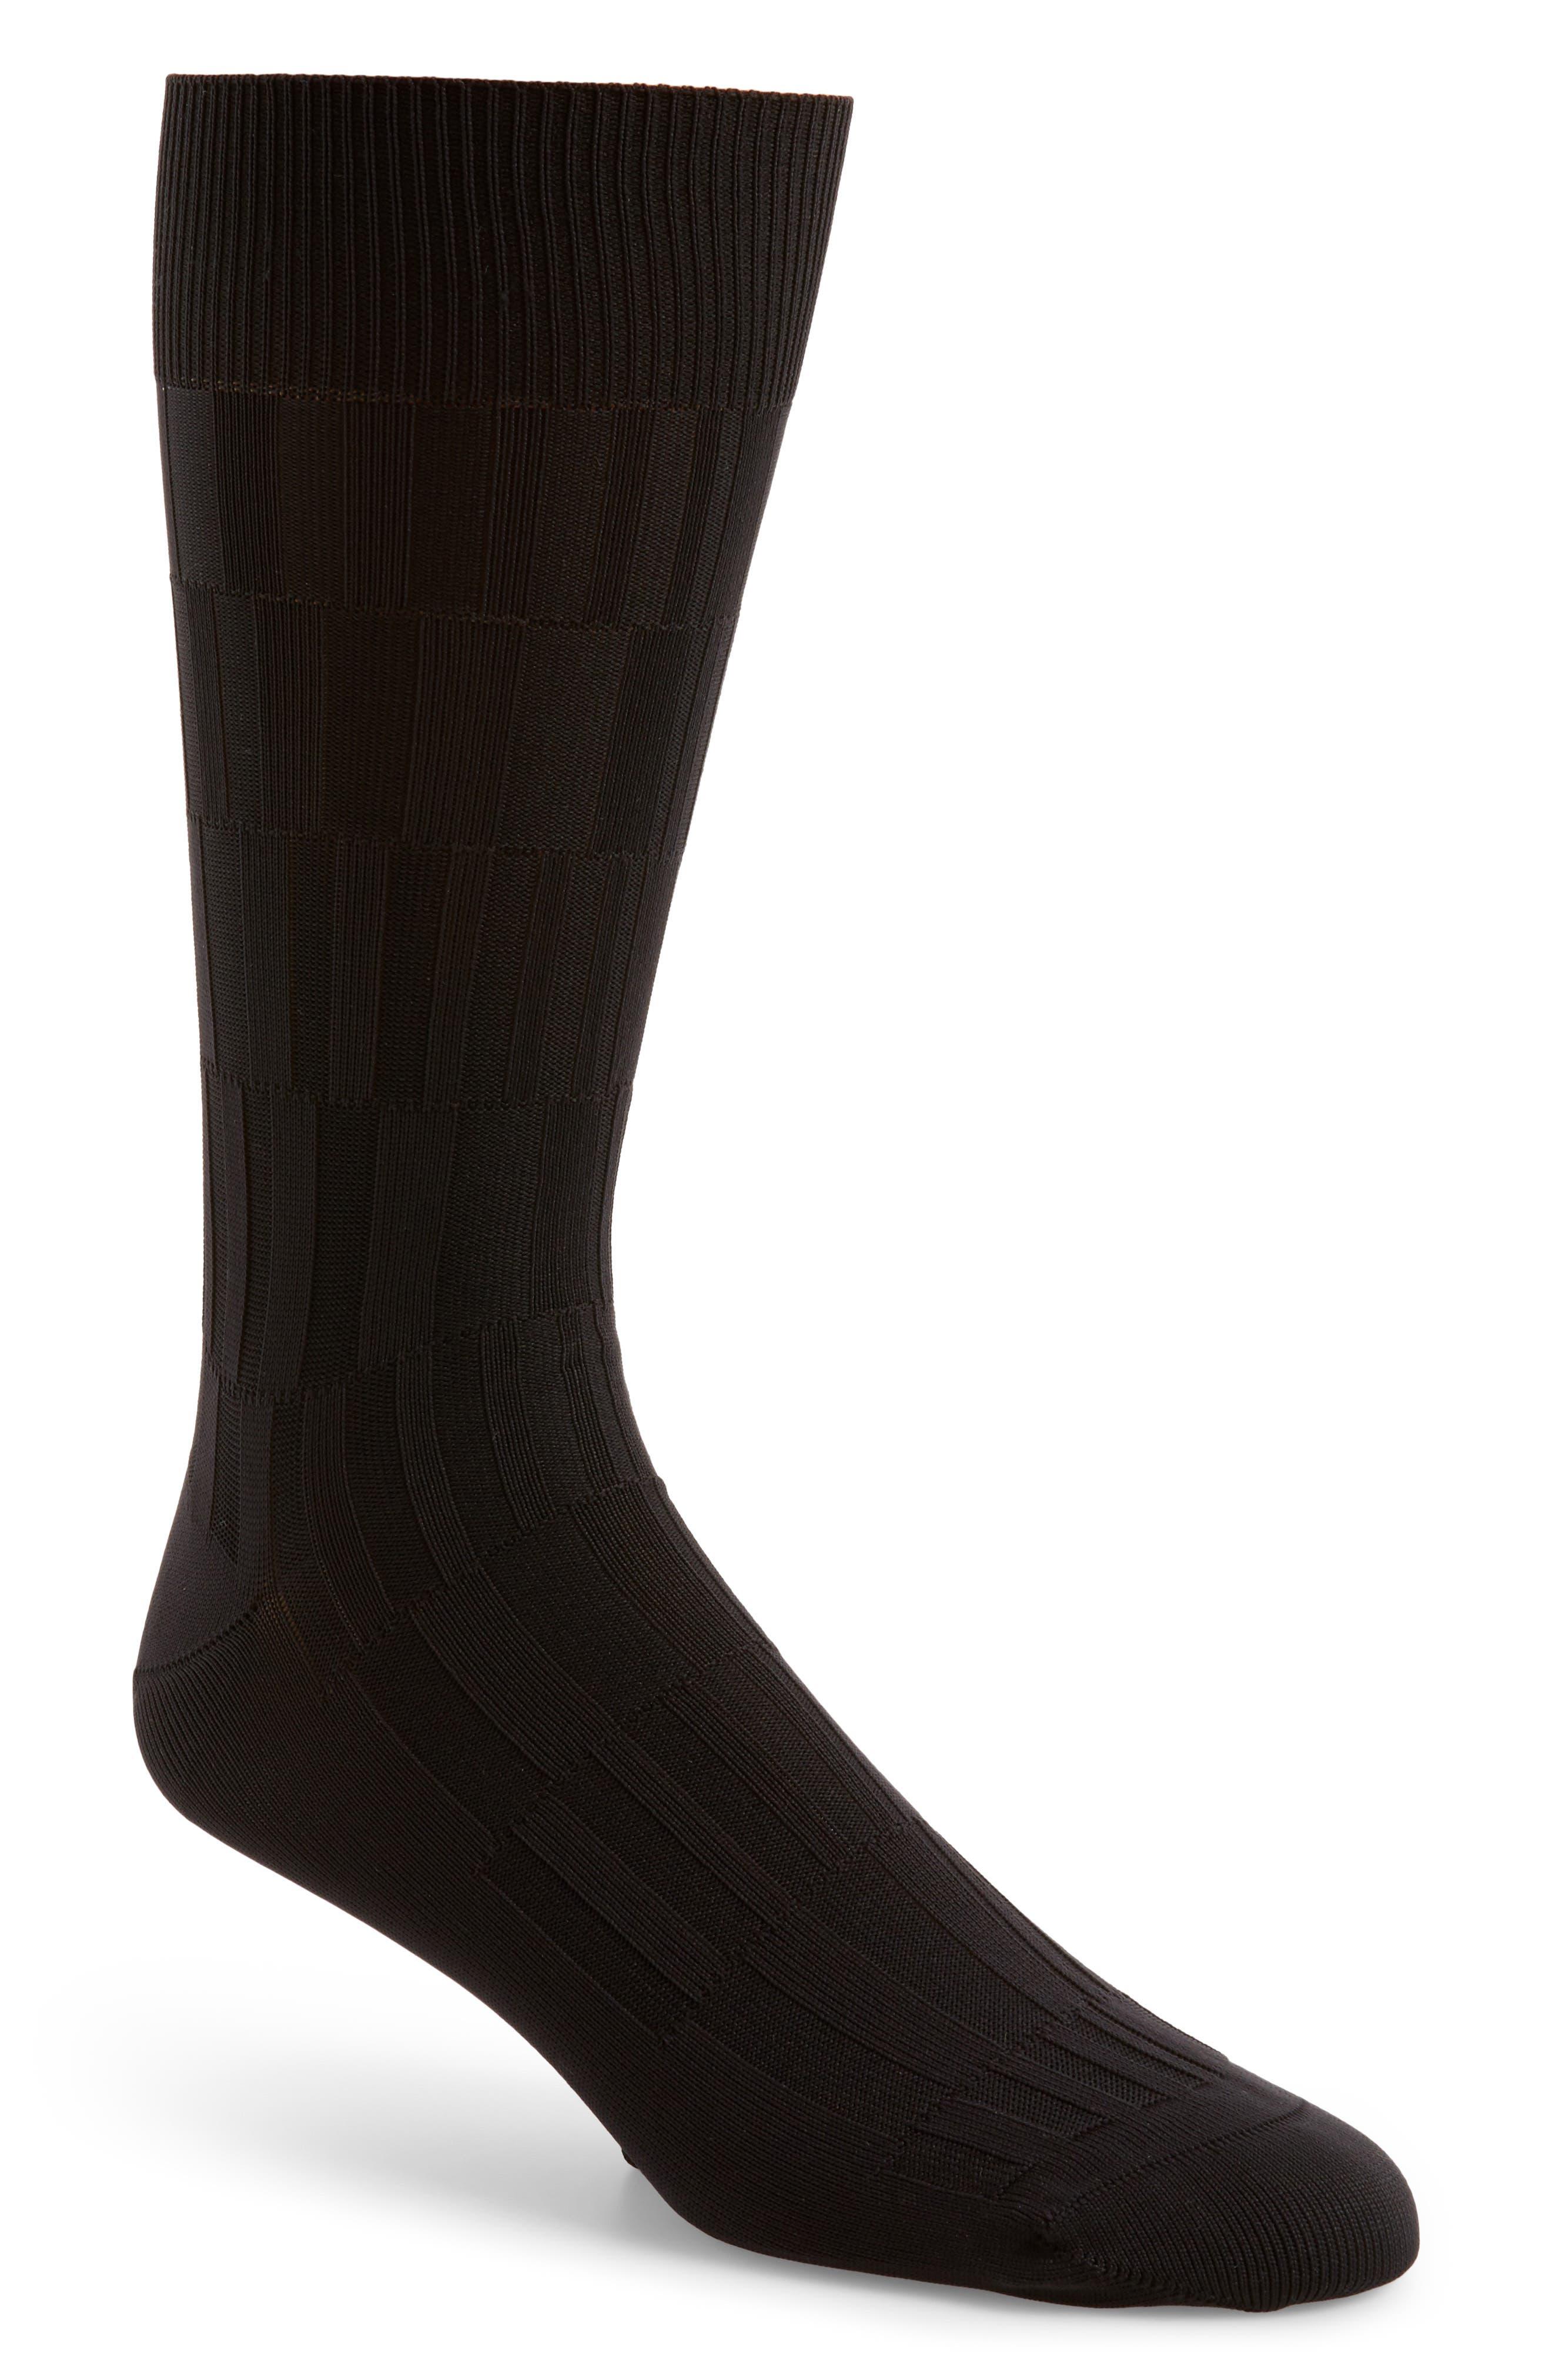 Bar Texture Socks,                         Main,                         color,